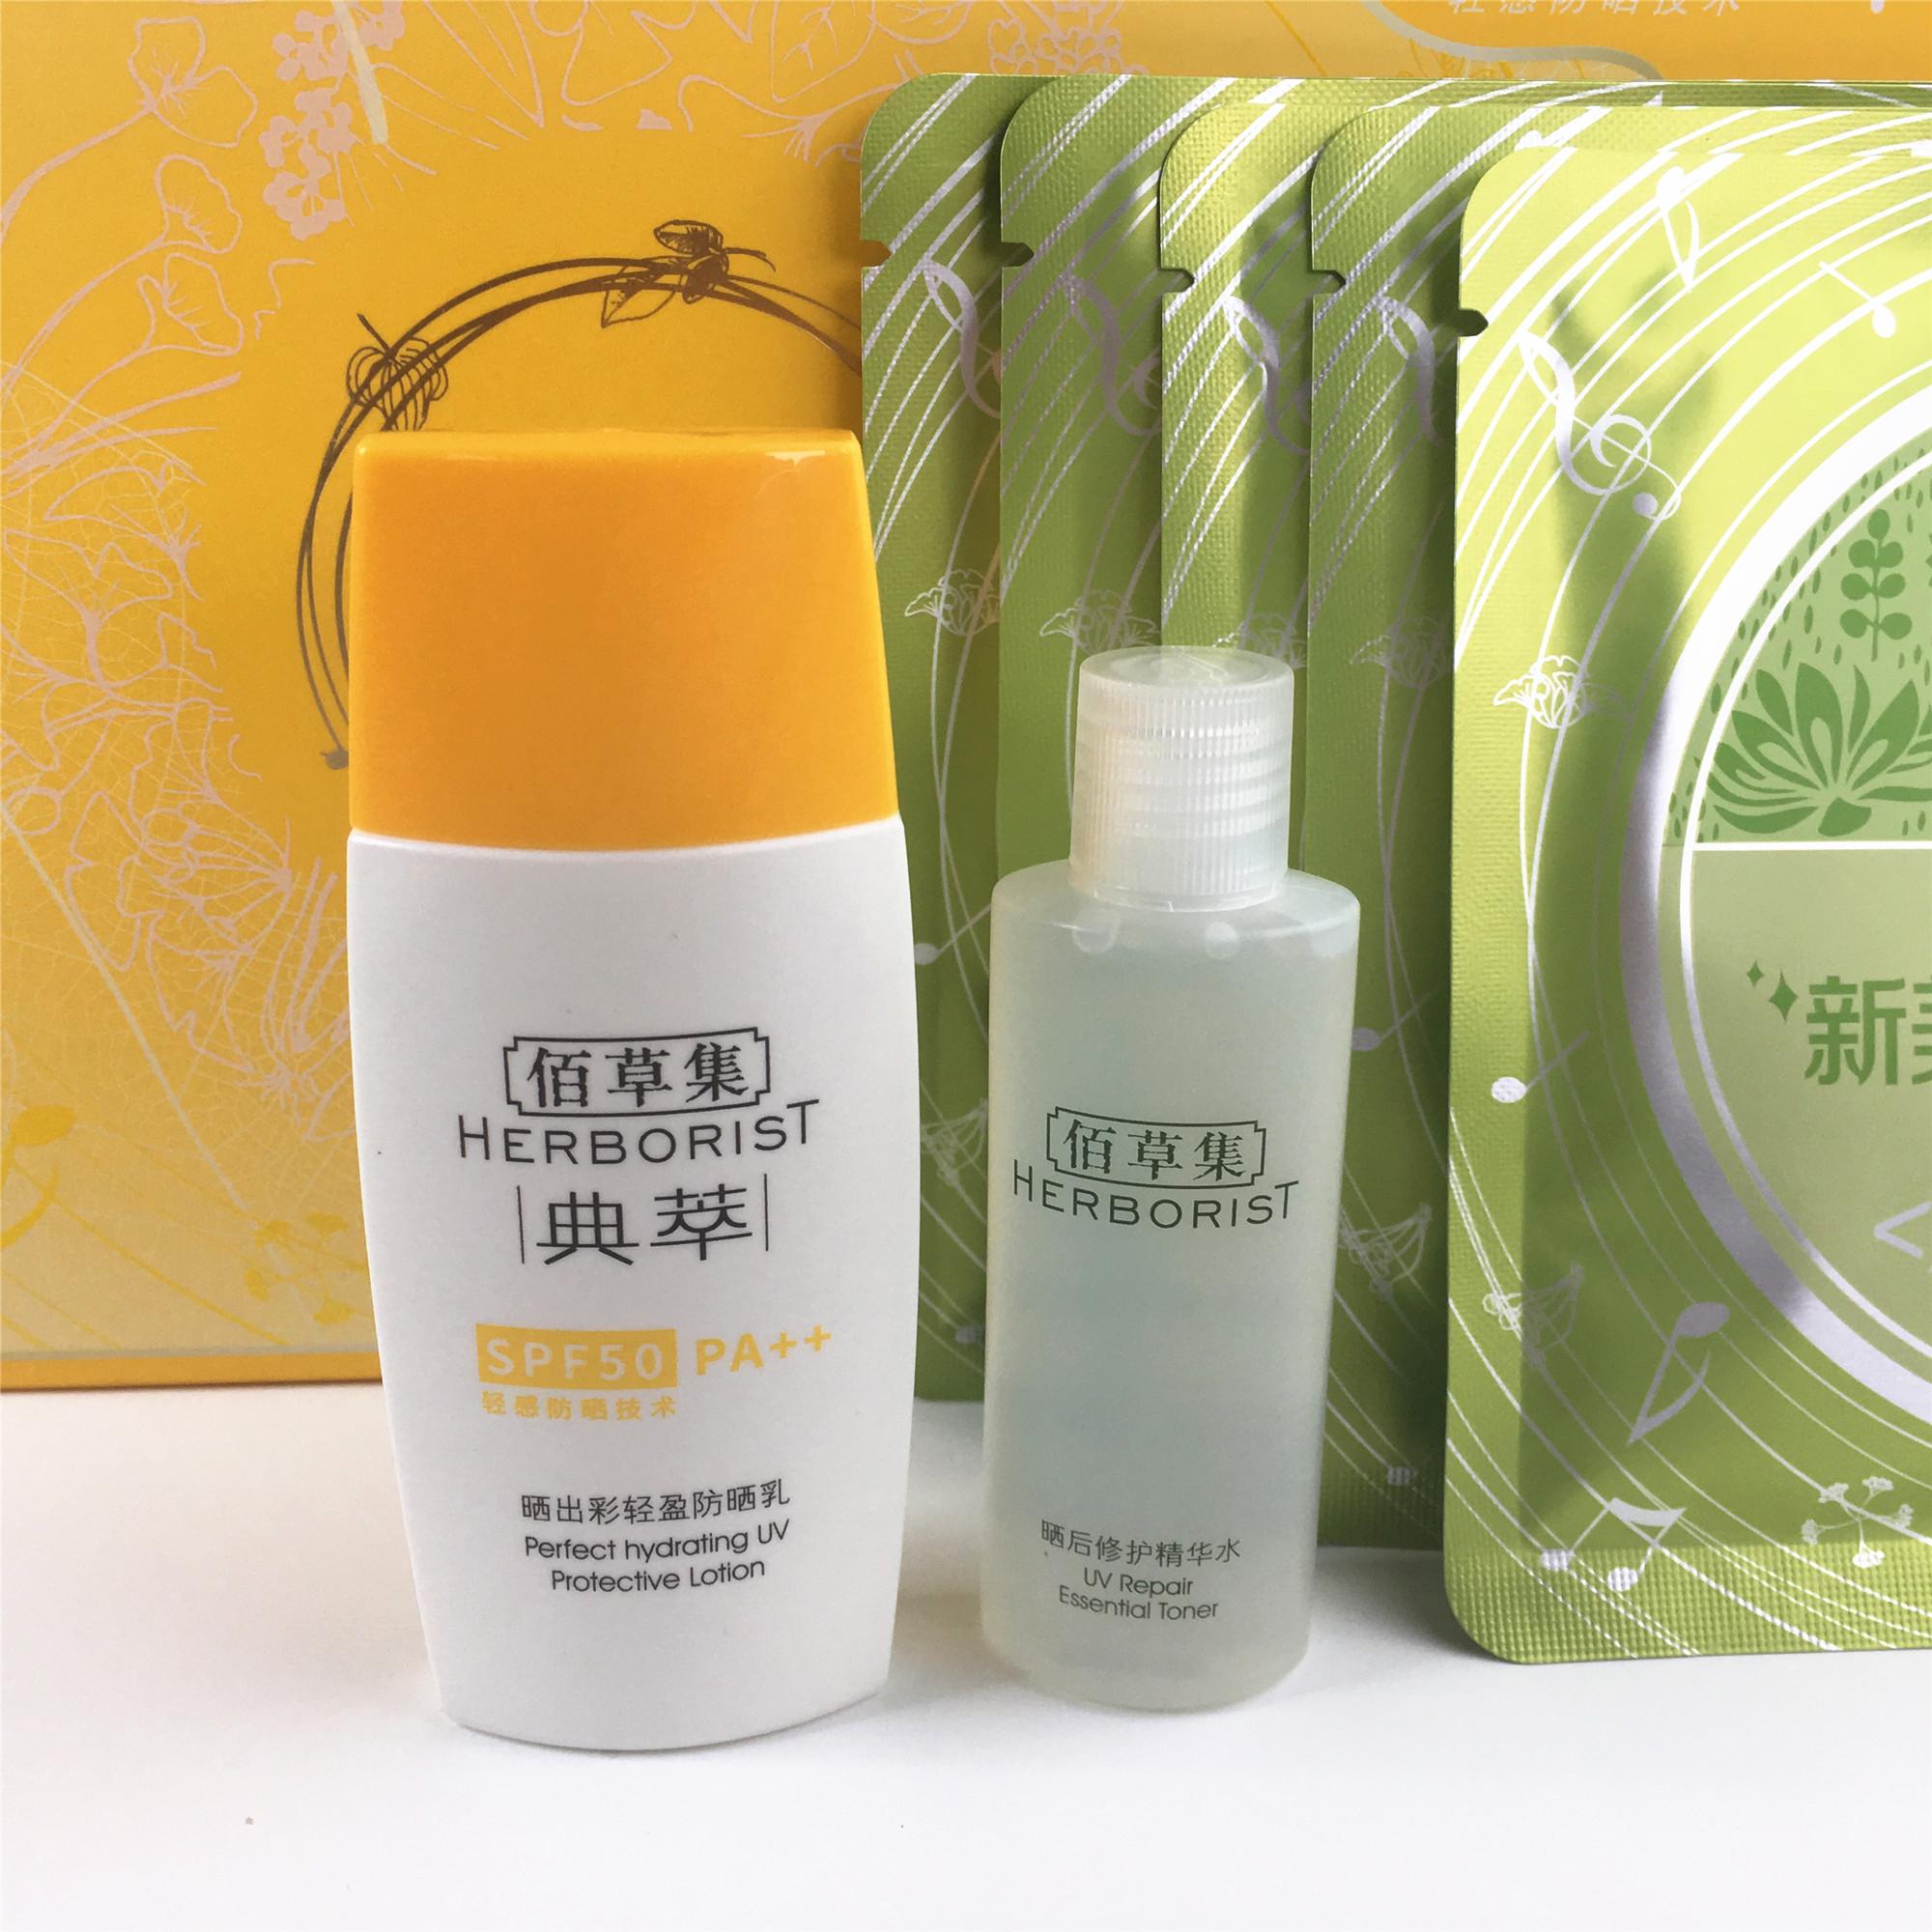 Herborist new sunscreen, sunscreen, light, sunscreen, 40mlspf50 emulsion, UV mask set.